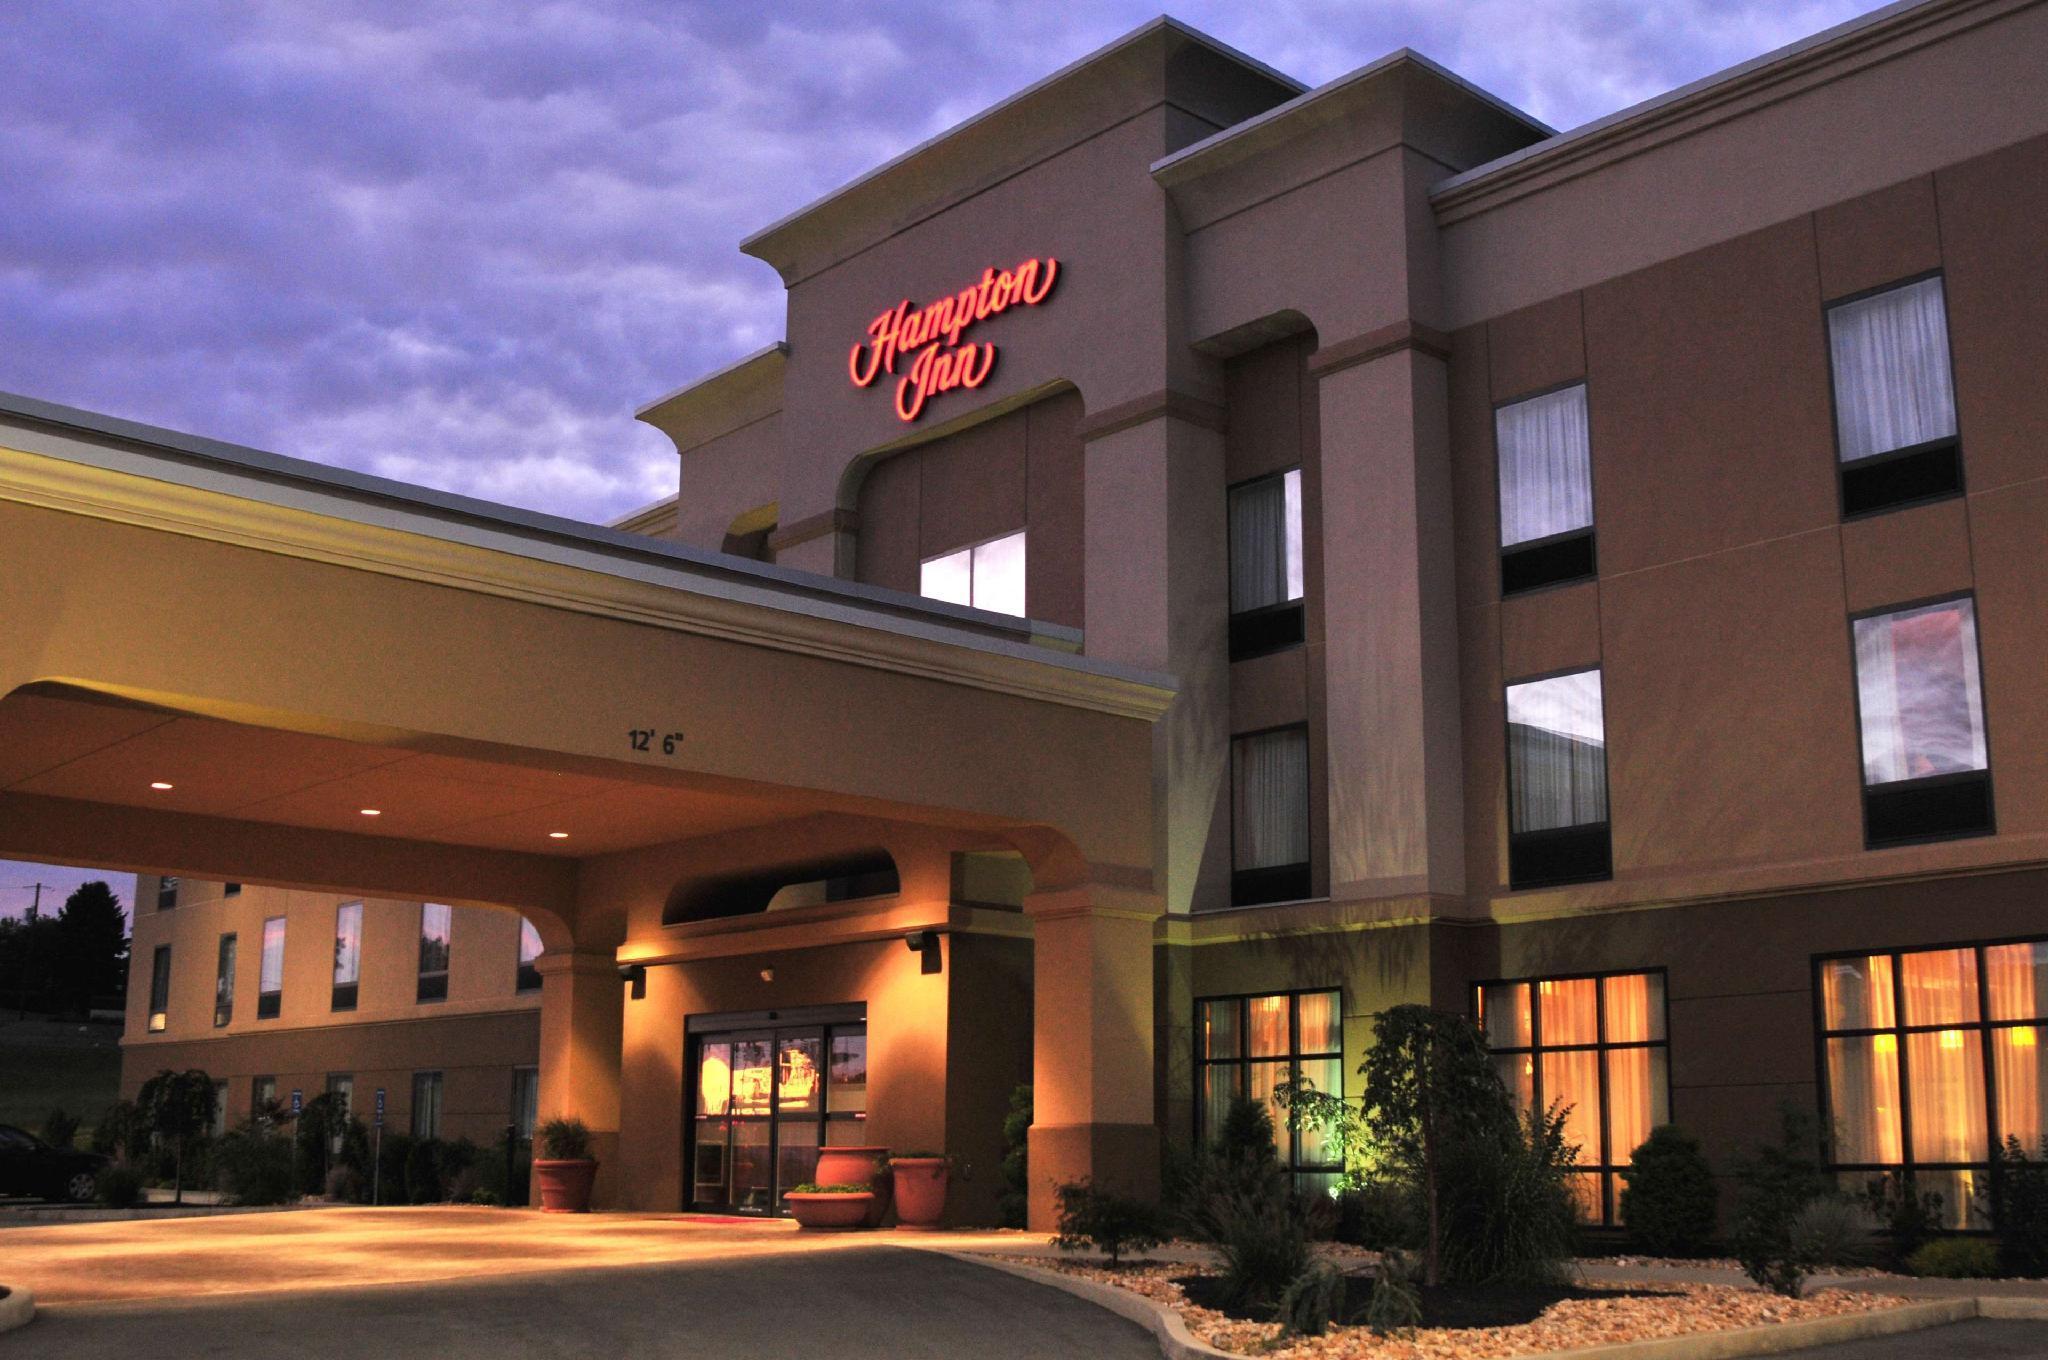 Hampton Inn And Suites Indiana